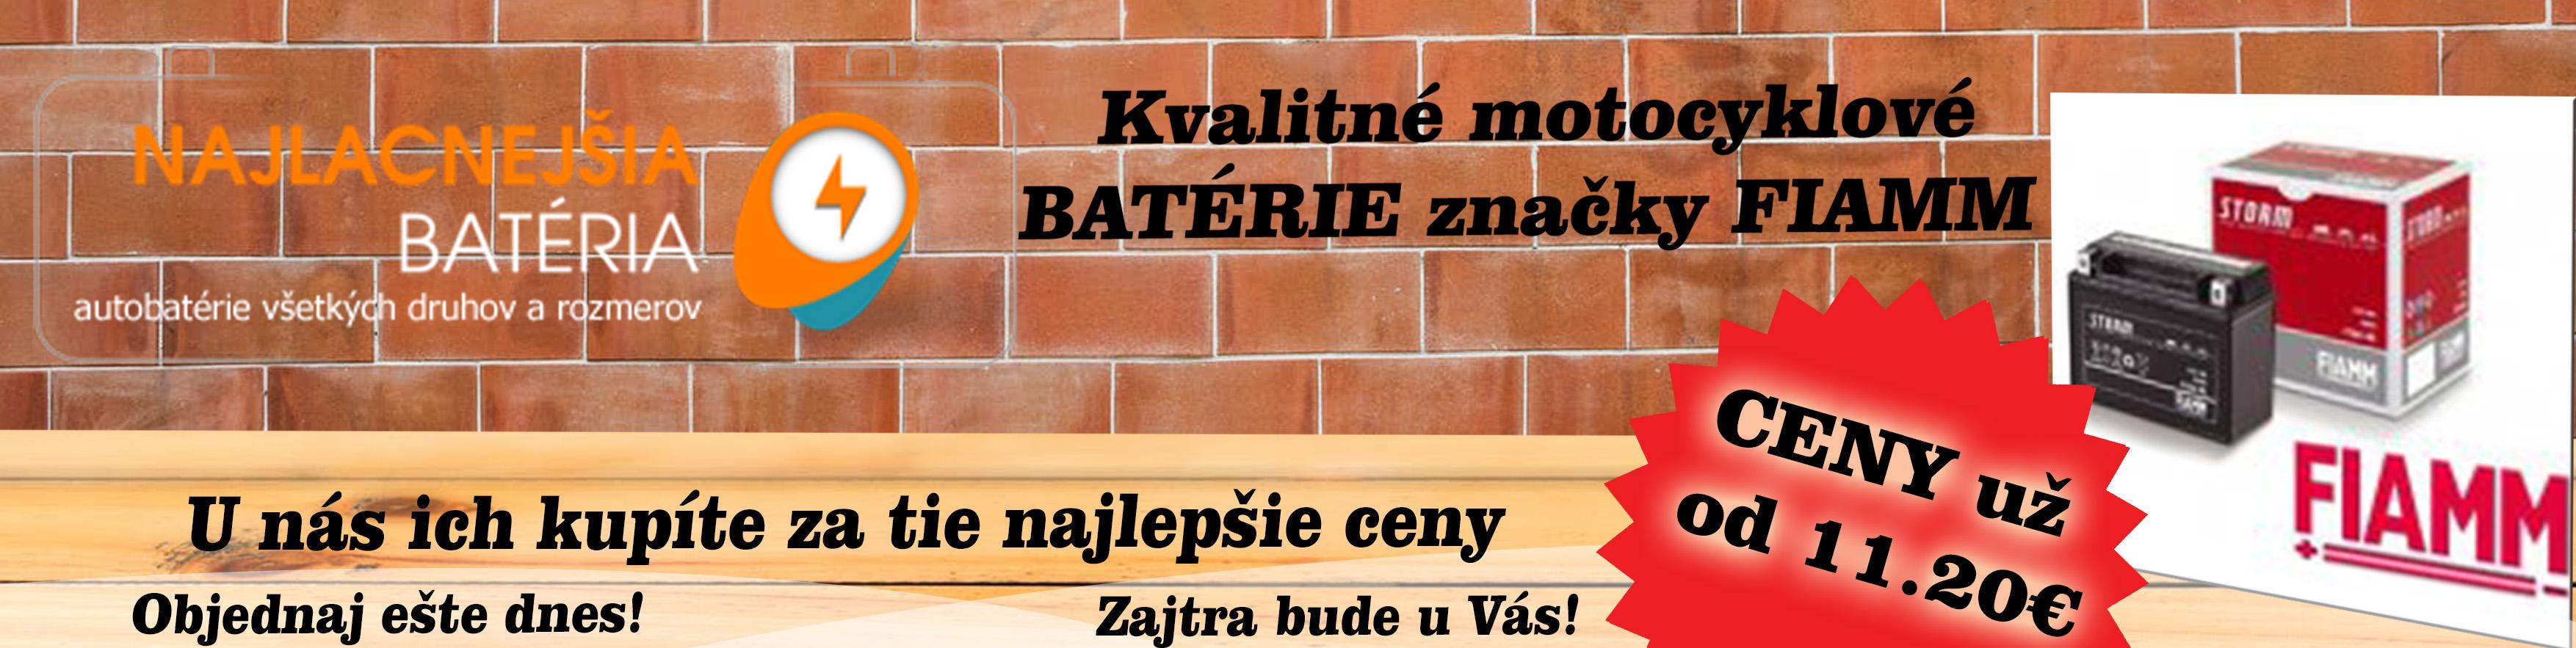 121d04297 Batérie pre motocykle - Autobatérie pre nákladné a osobné autá, motorky